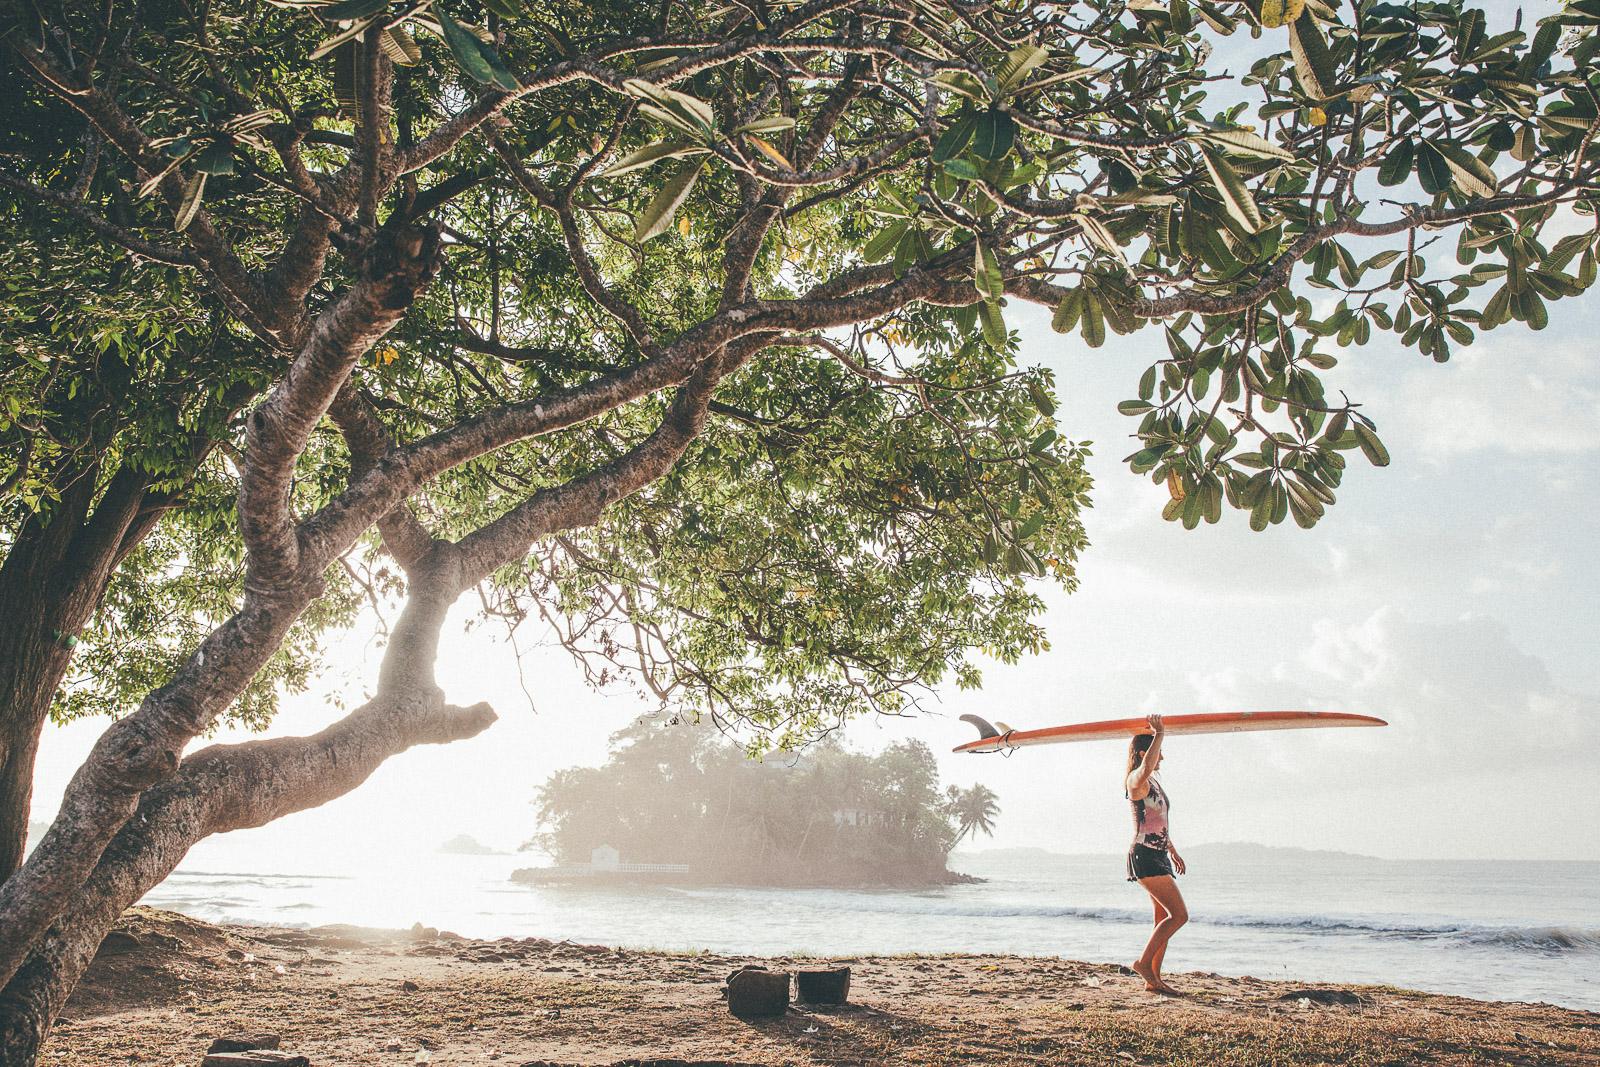 sunshinestories-surf-travel-blog-img_6622